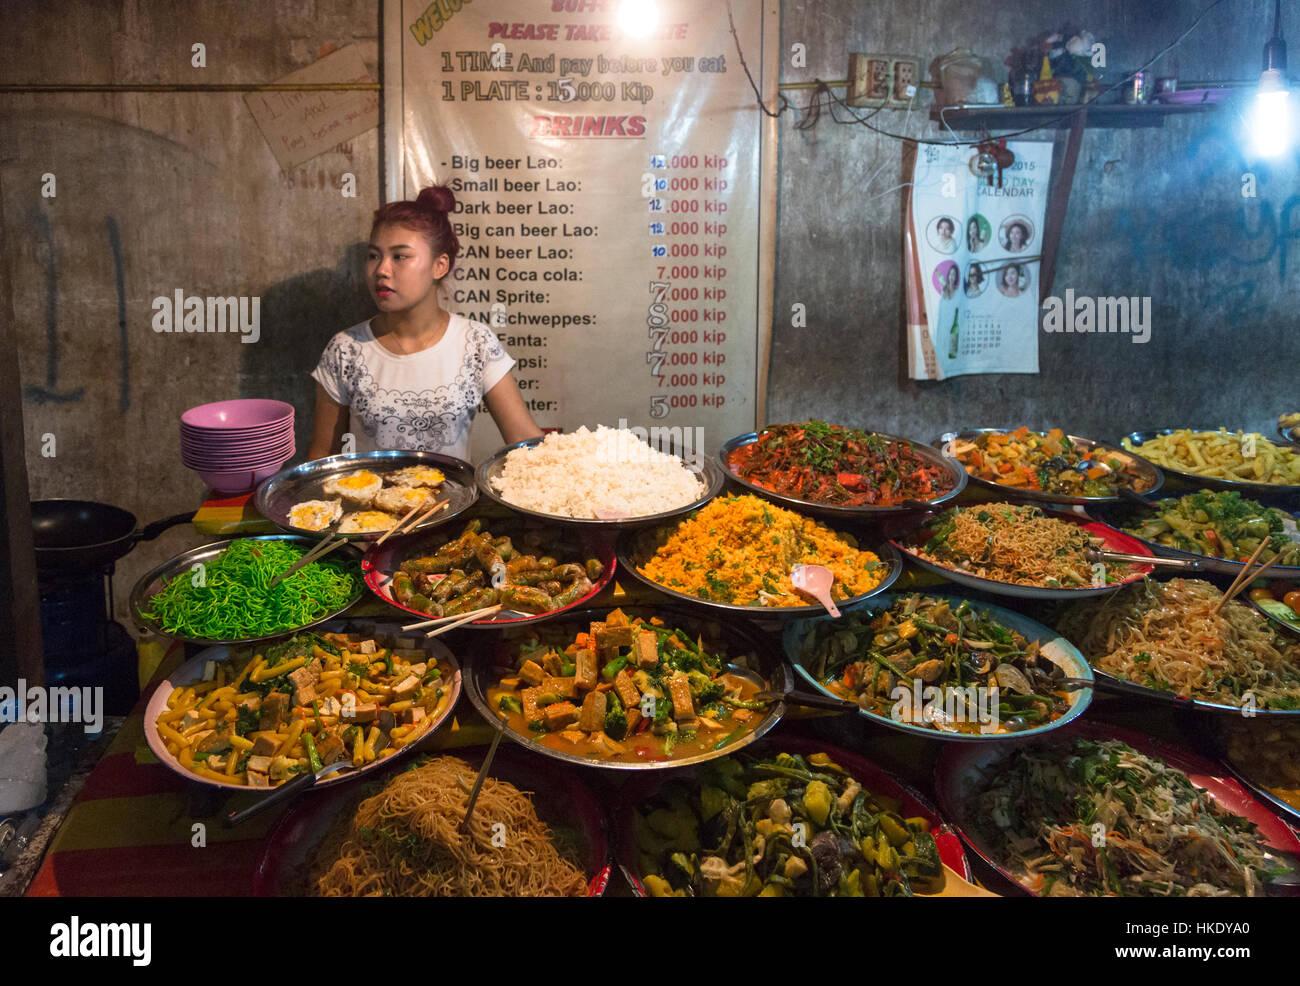 LUANG PRABANG, LAOS - MAY 15 2015: A young Laotian woman sells food to tourists in a market stall in Luang Prabang - Stock Image